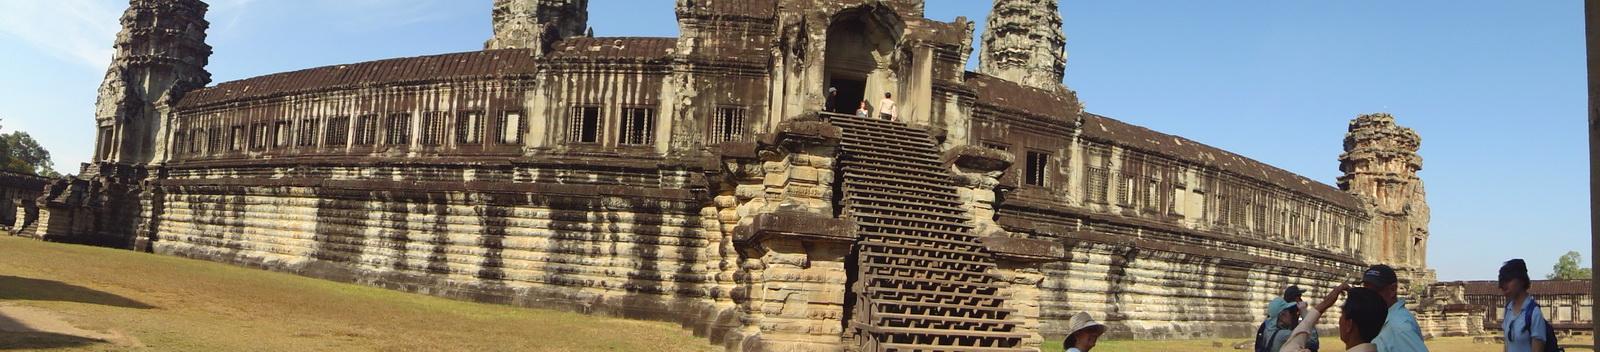 Angkor Wat Khmer architecture internal gallery E entrance 01